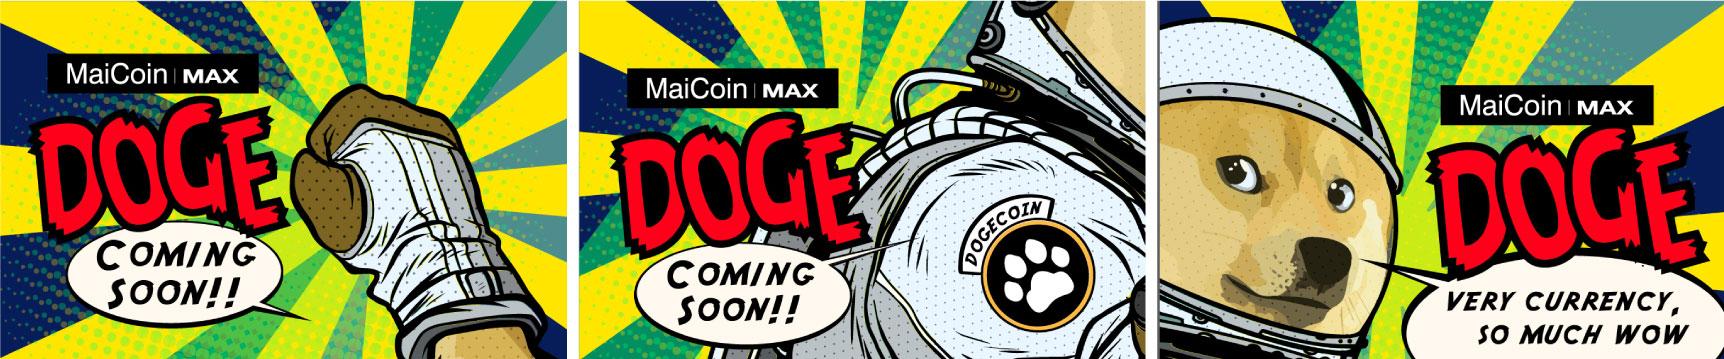 Doge coming soon